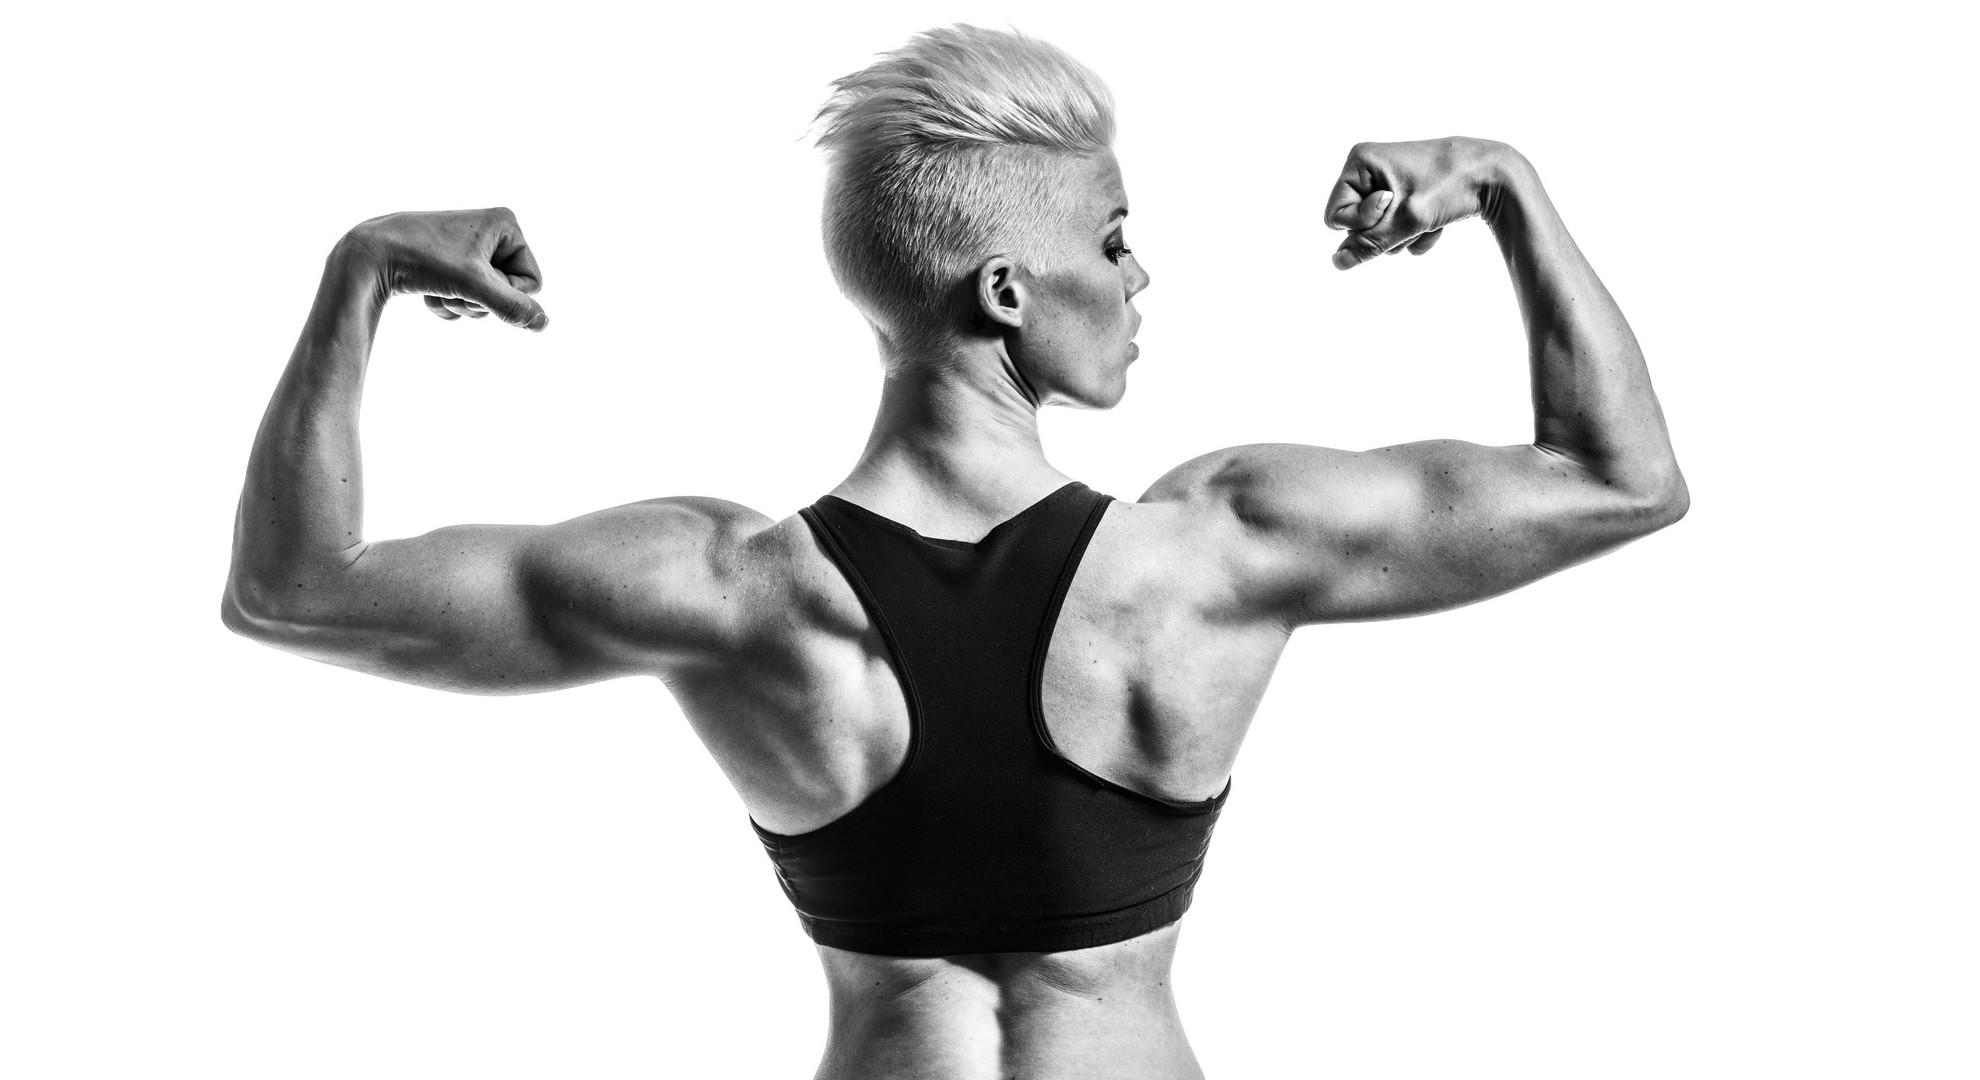 Hintergrundbilder : Frau, einfarbig, Modell-, kurzes Haar, Muskeln ...